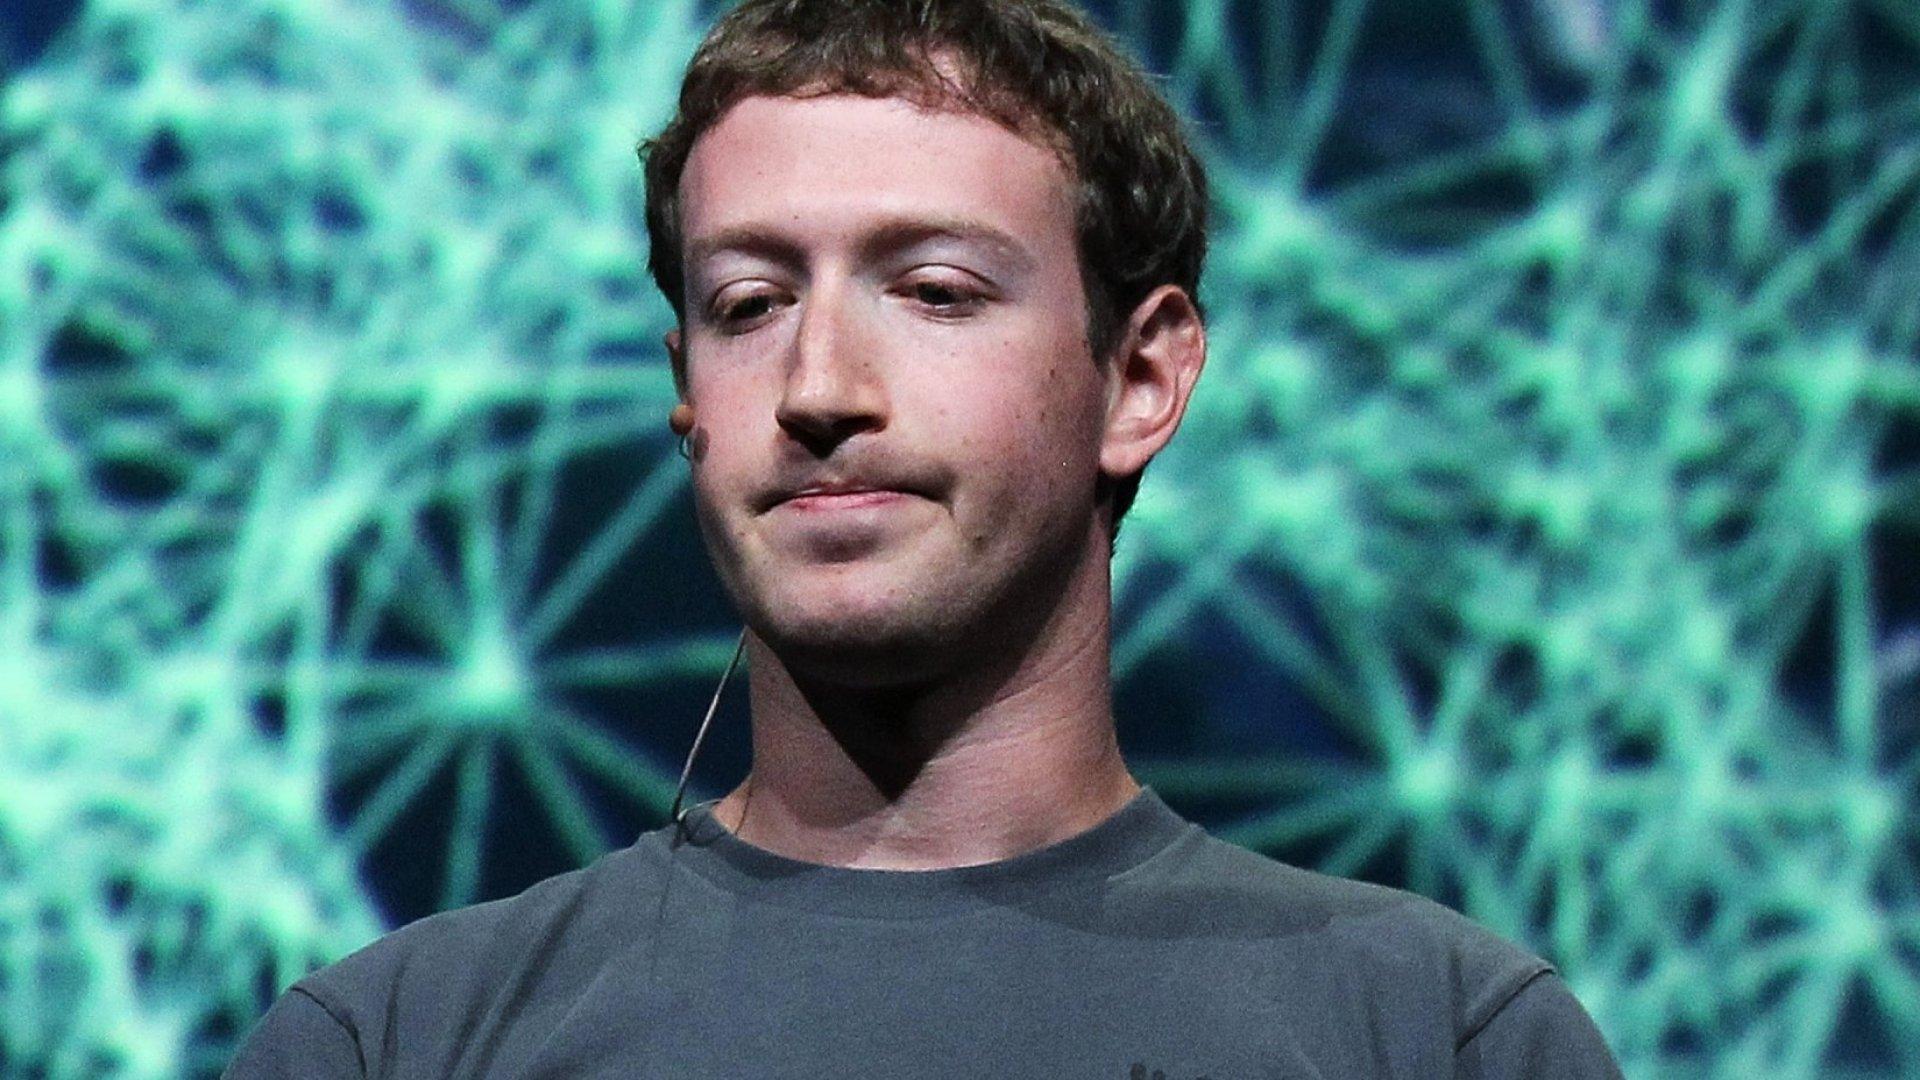 Under a microscope: Mark Zuckerberg